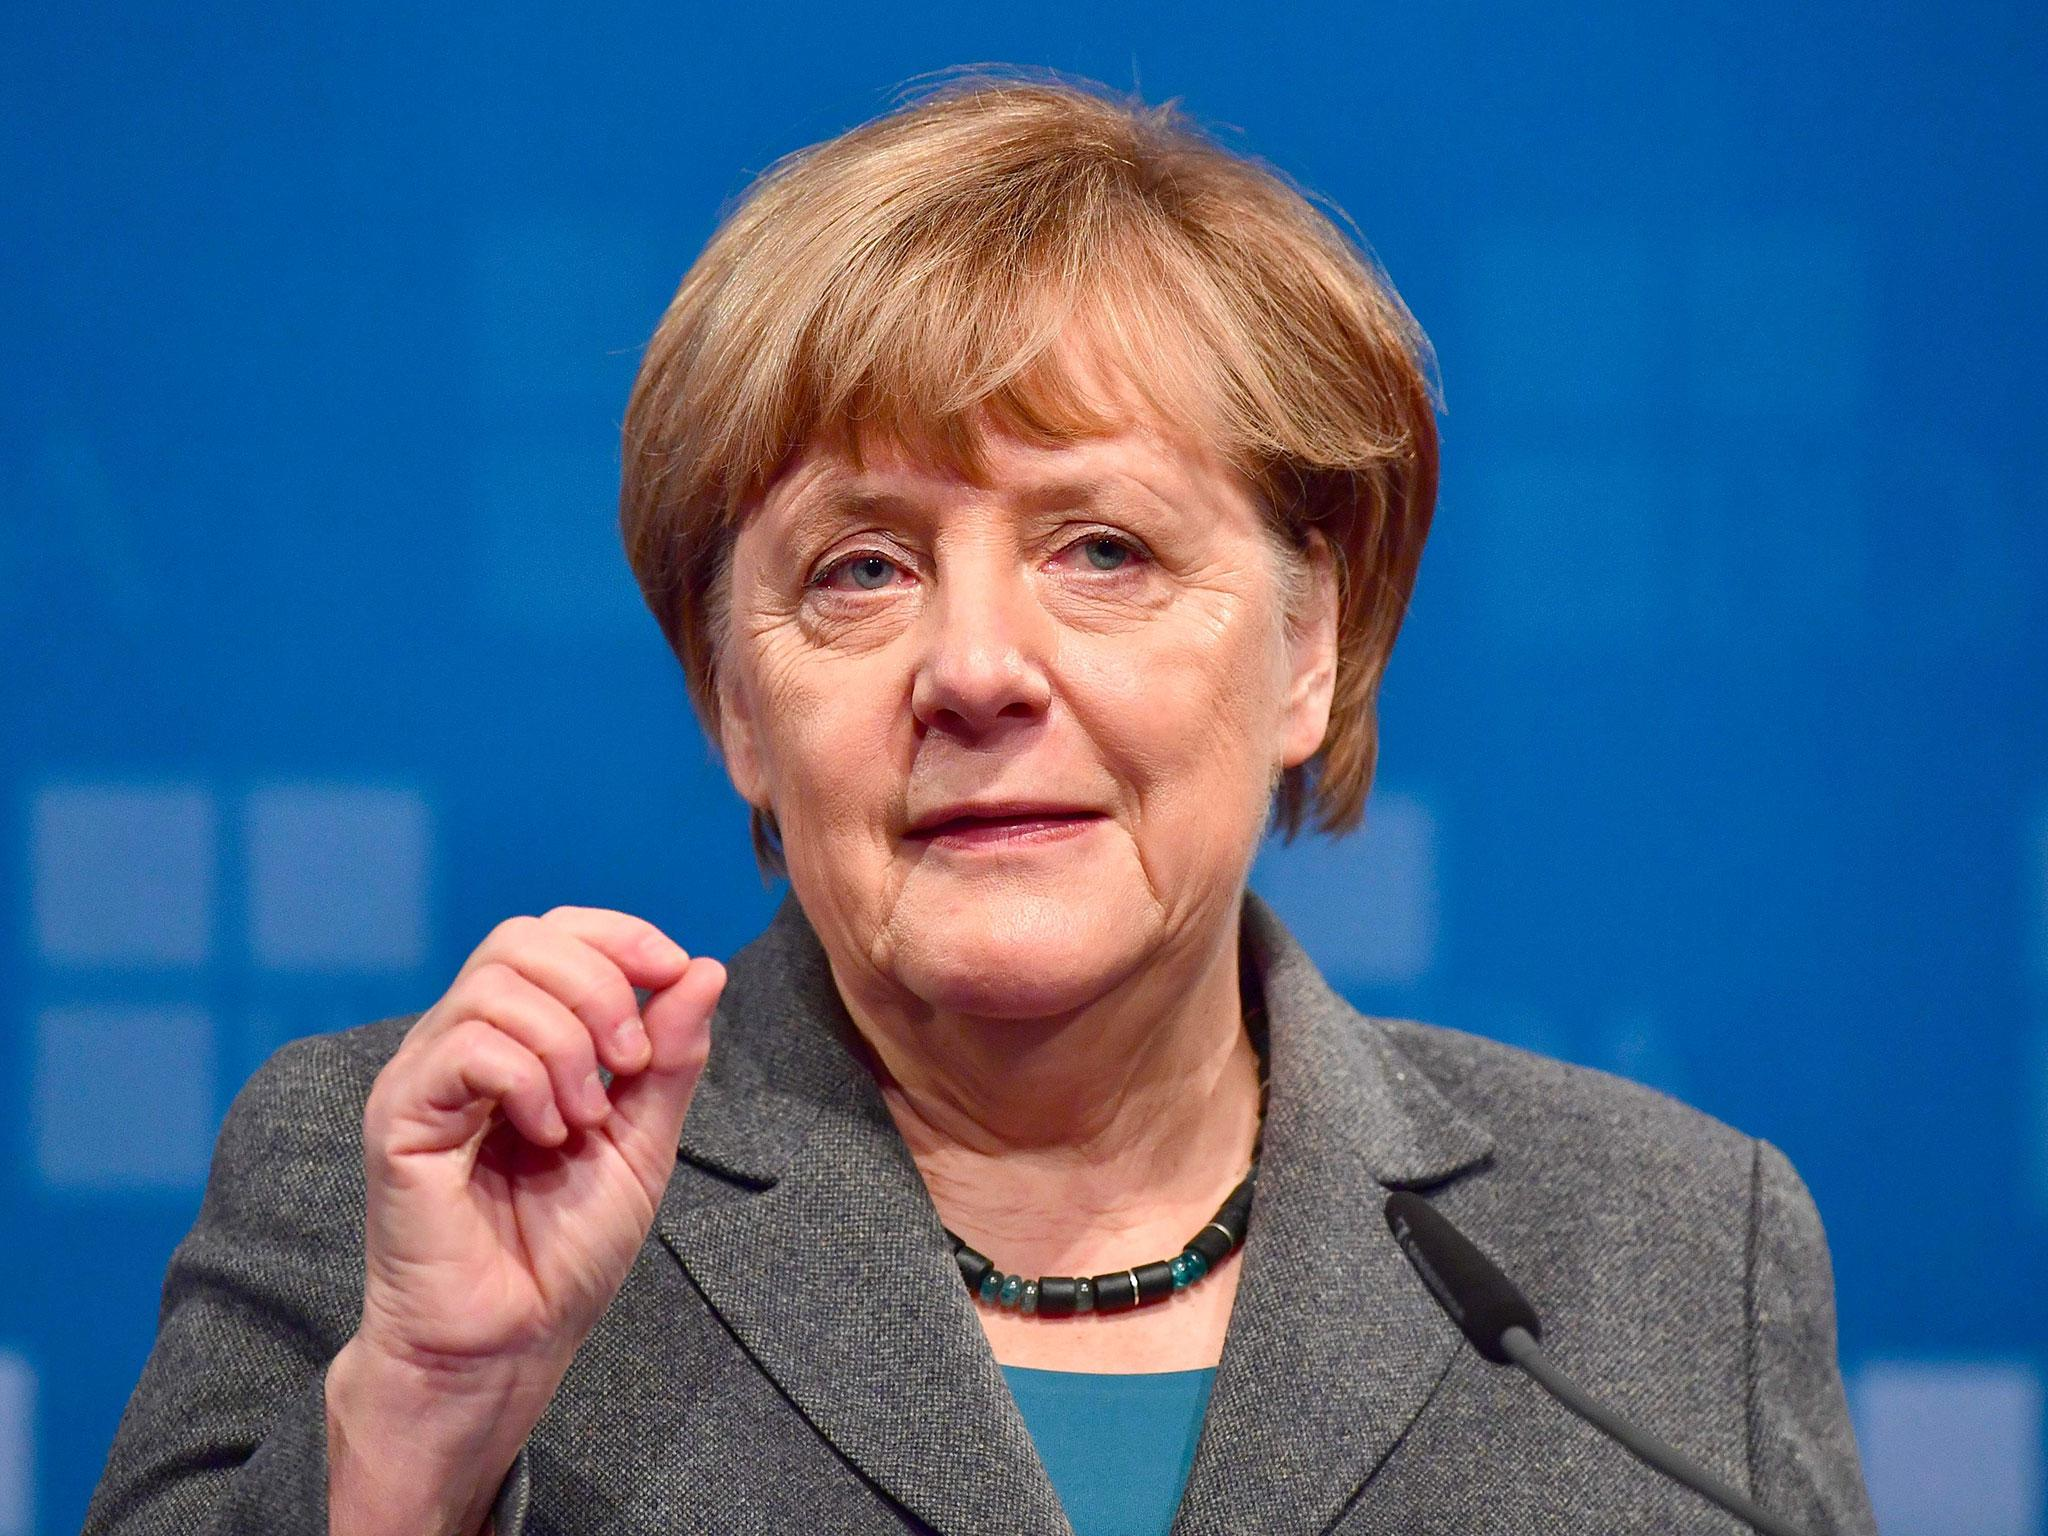 Angela Merkel branded new 'leader of the free world' as ...